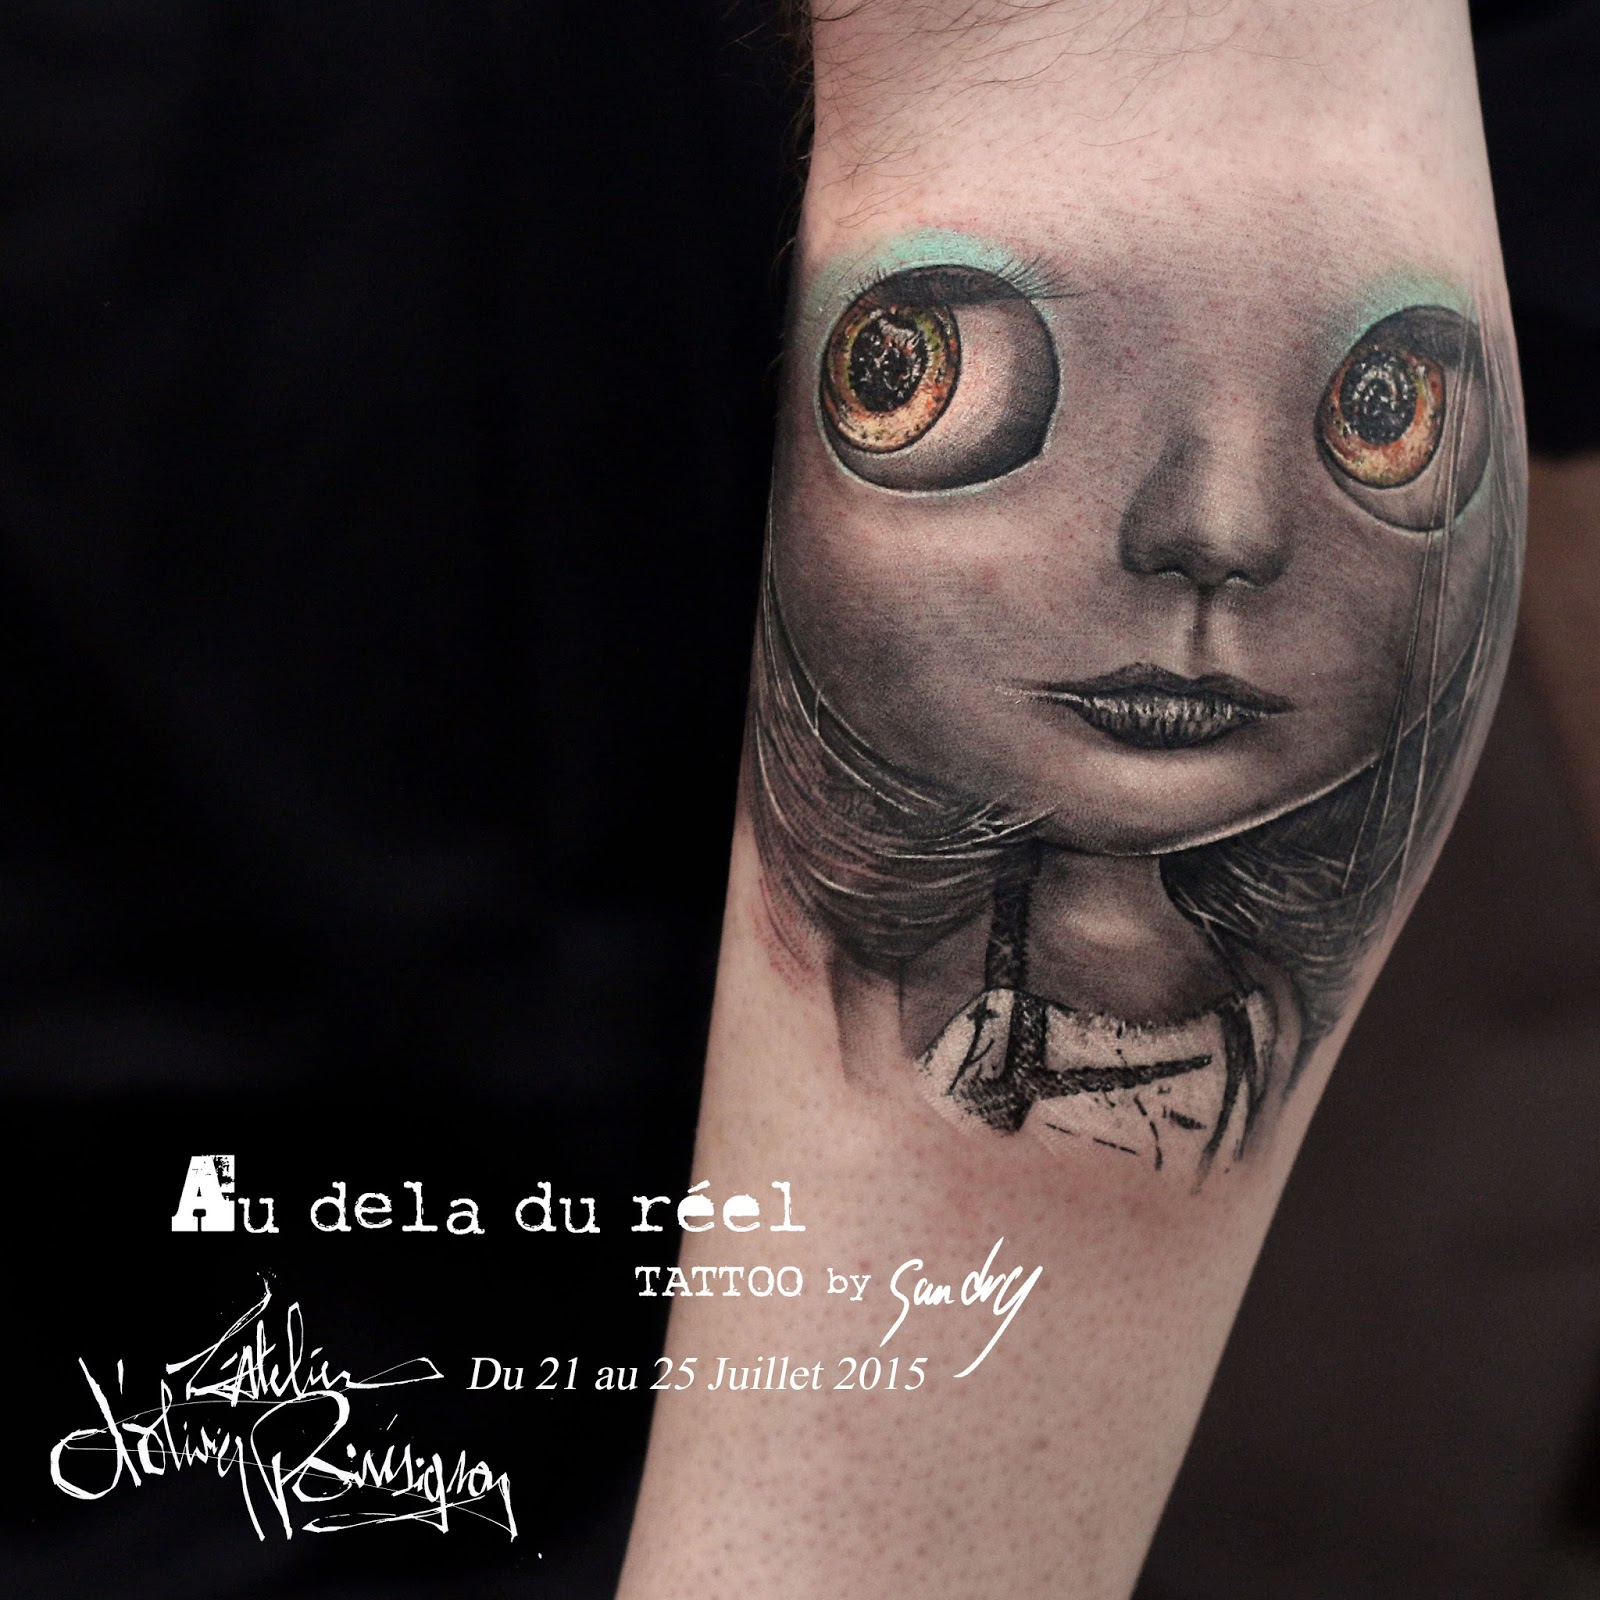 Tatouage sur la paume Sortir Ensemble - tatouage paume de la main